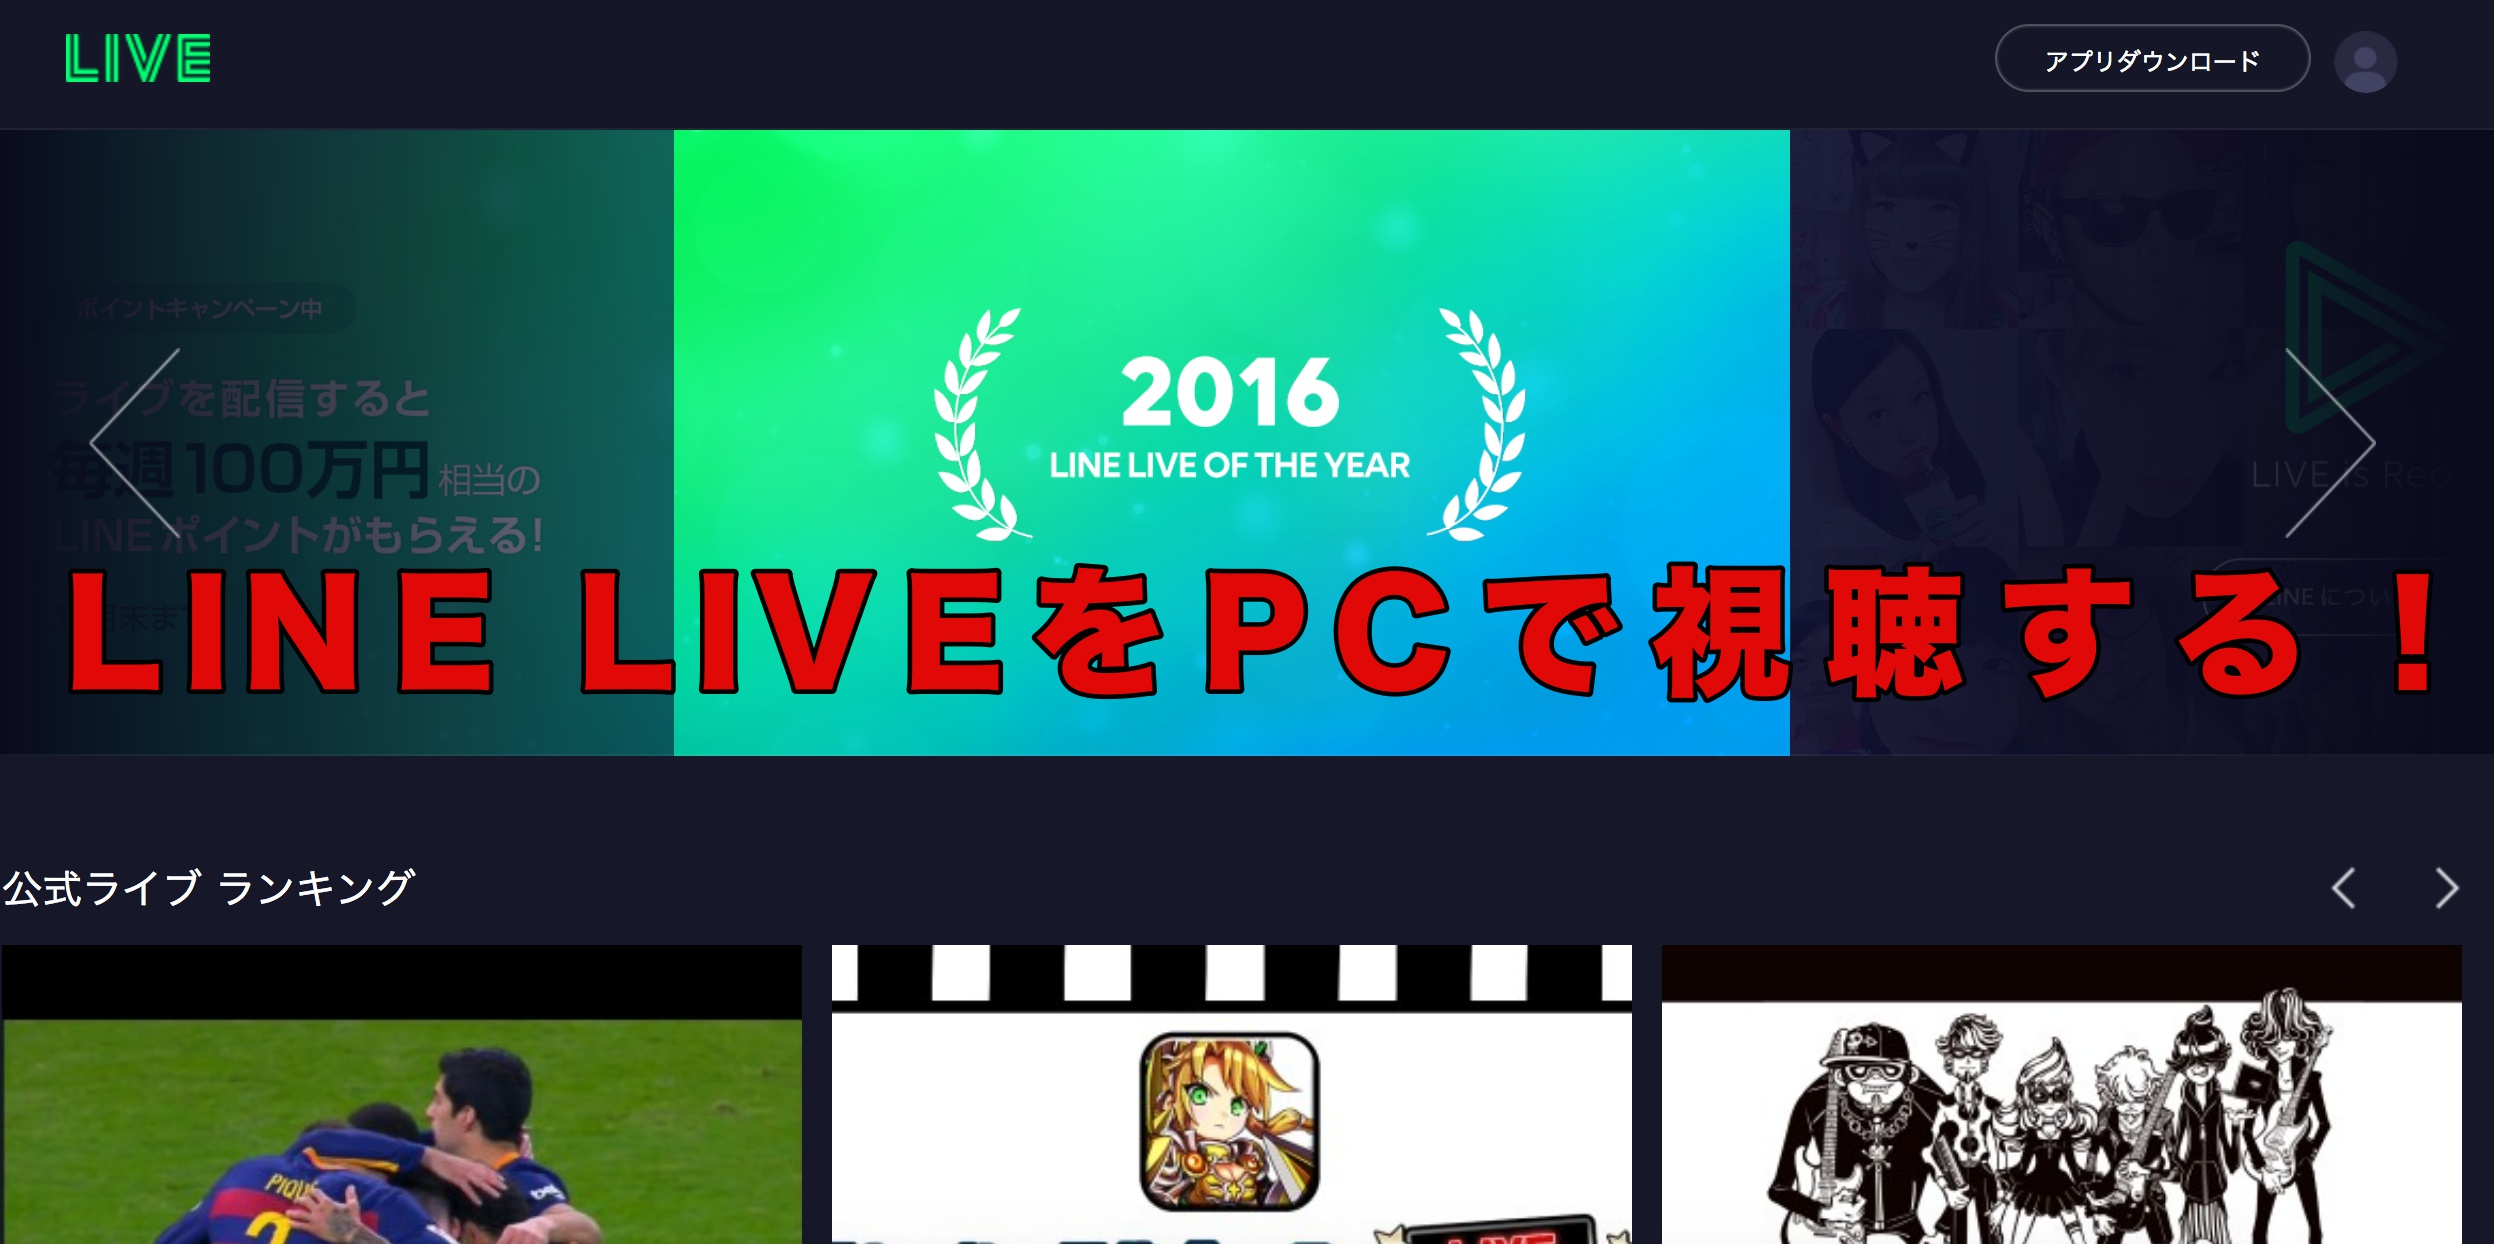 LINE LIVEをPCで視聴する方法!アップデートで更に利便性が向上!